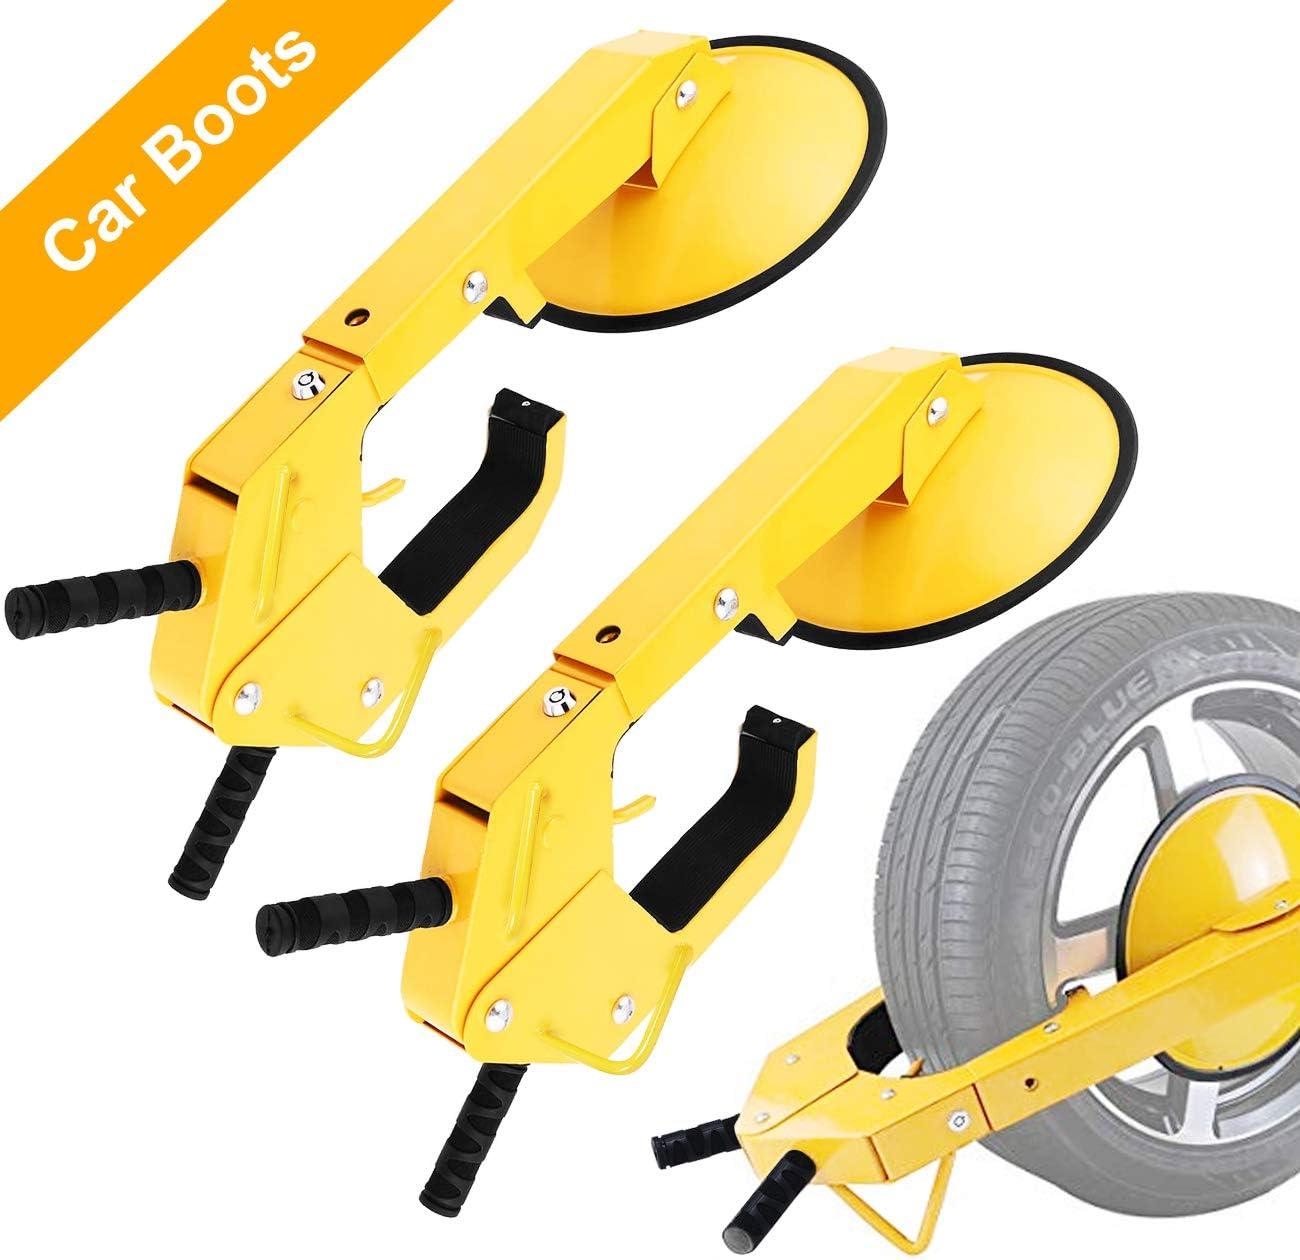 Adjustable Tire Lock Chock Anti-Theft Wheel Lock Boot Wheel Lock Tire Lock Clamp for Auto Car Trailer Truck SUV ATV RV ALAVENTE 2 Pcs Car Wheel Lock